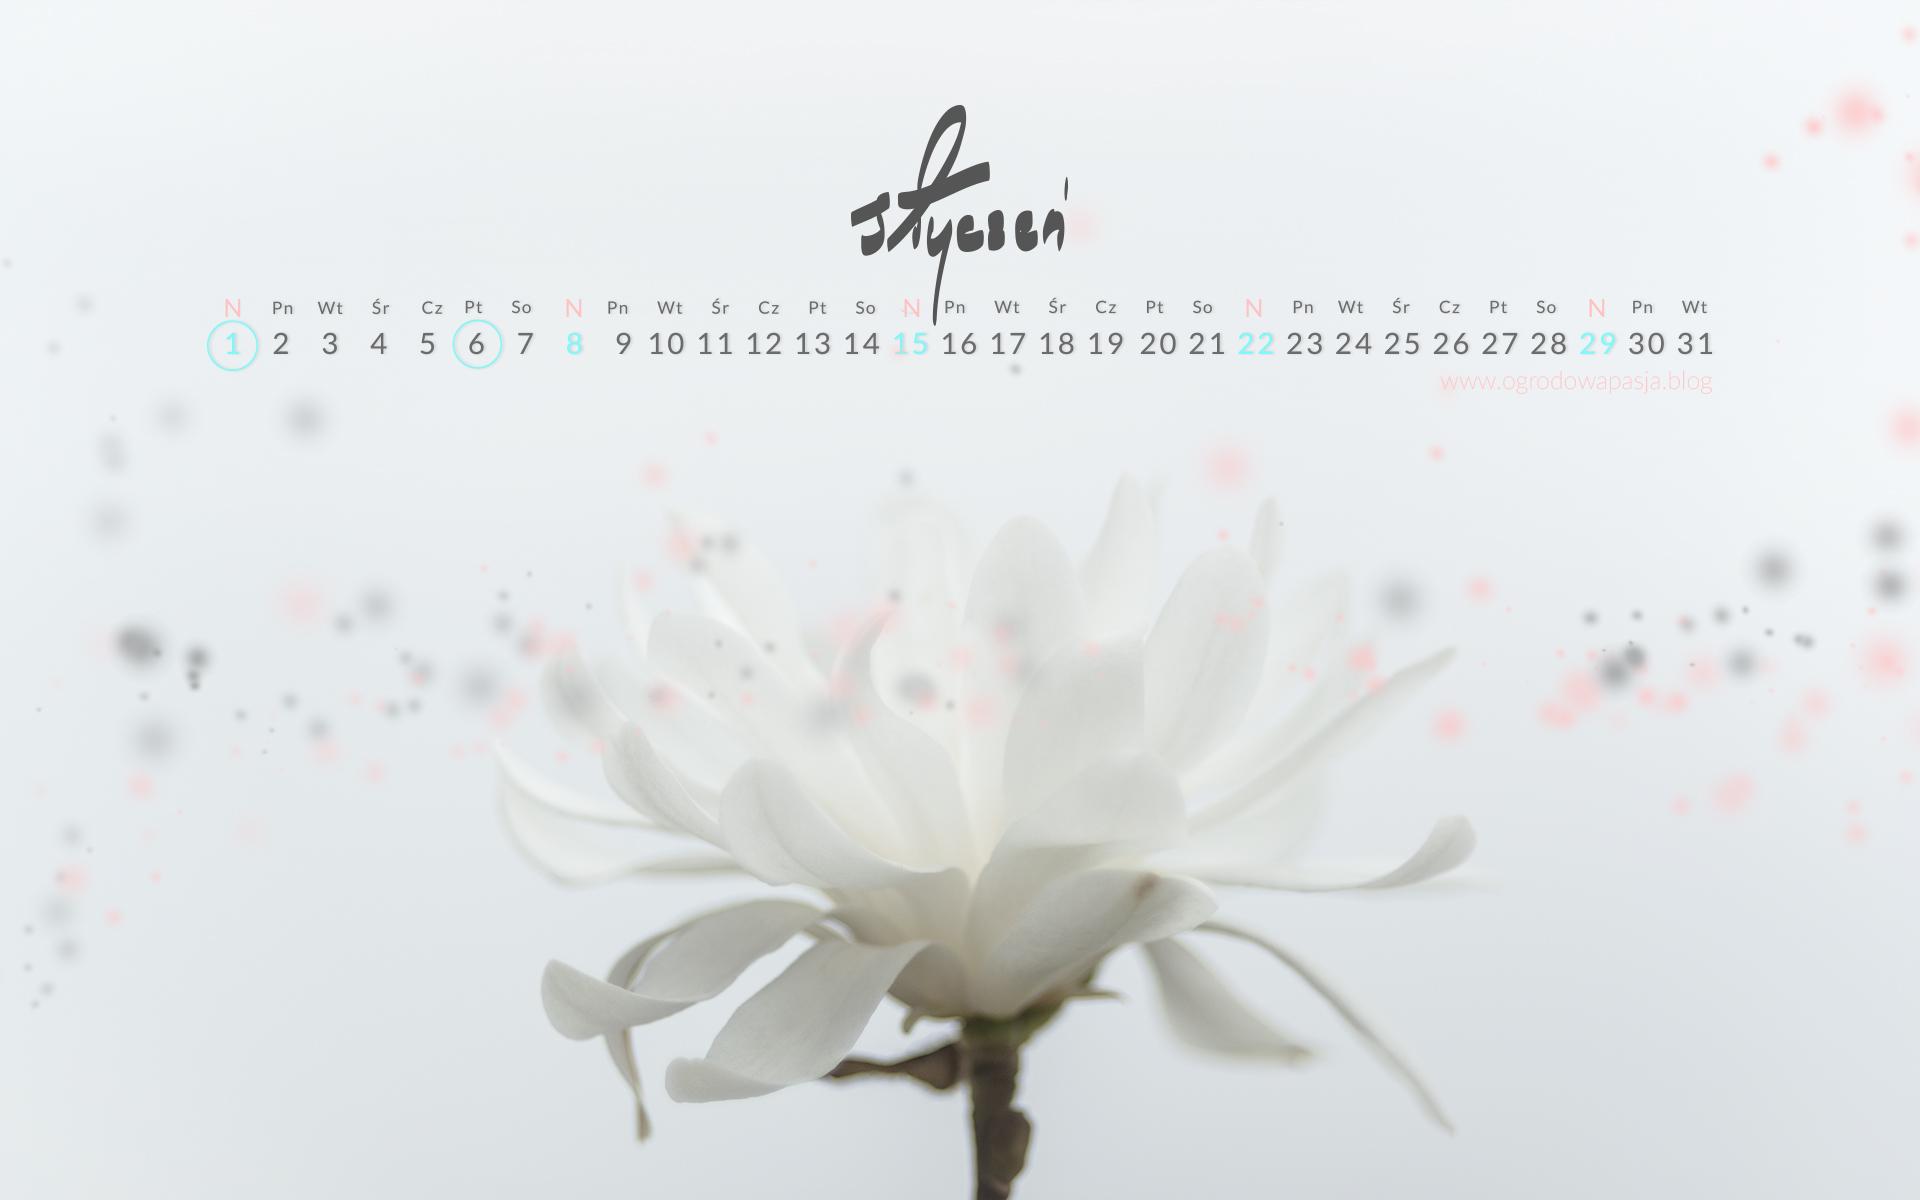 kalendarz na pulpit 2017 styczeń